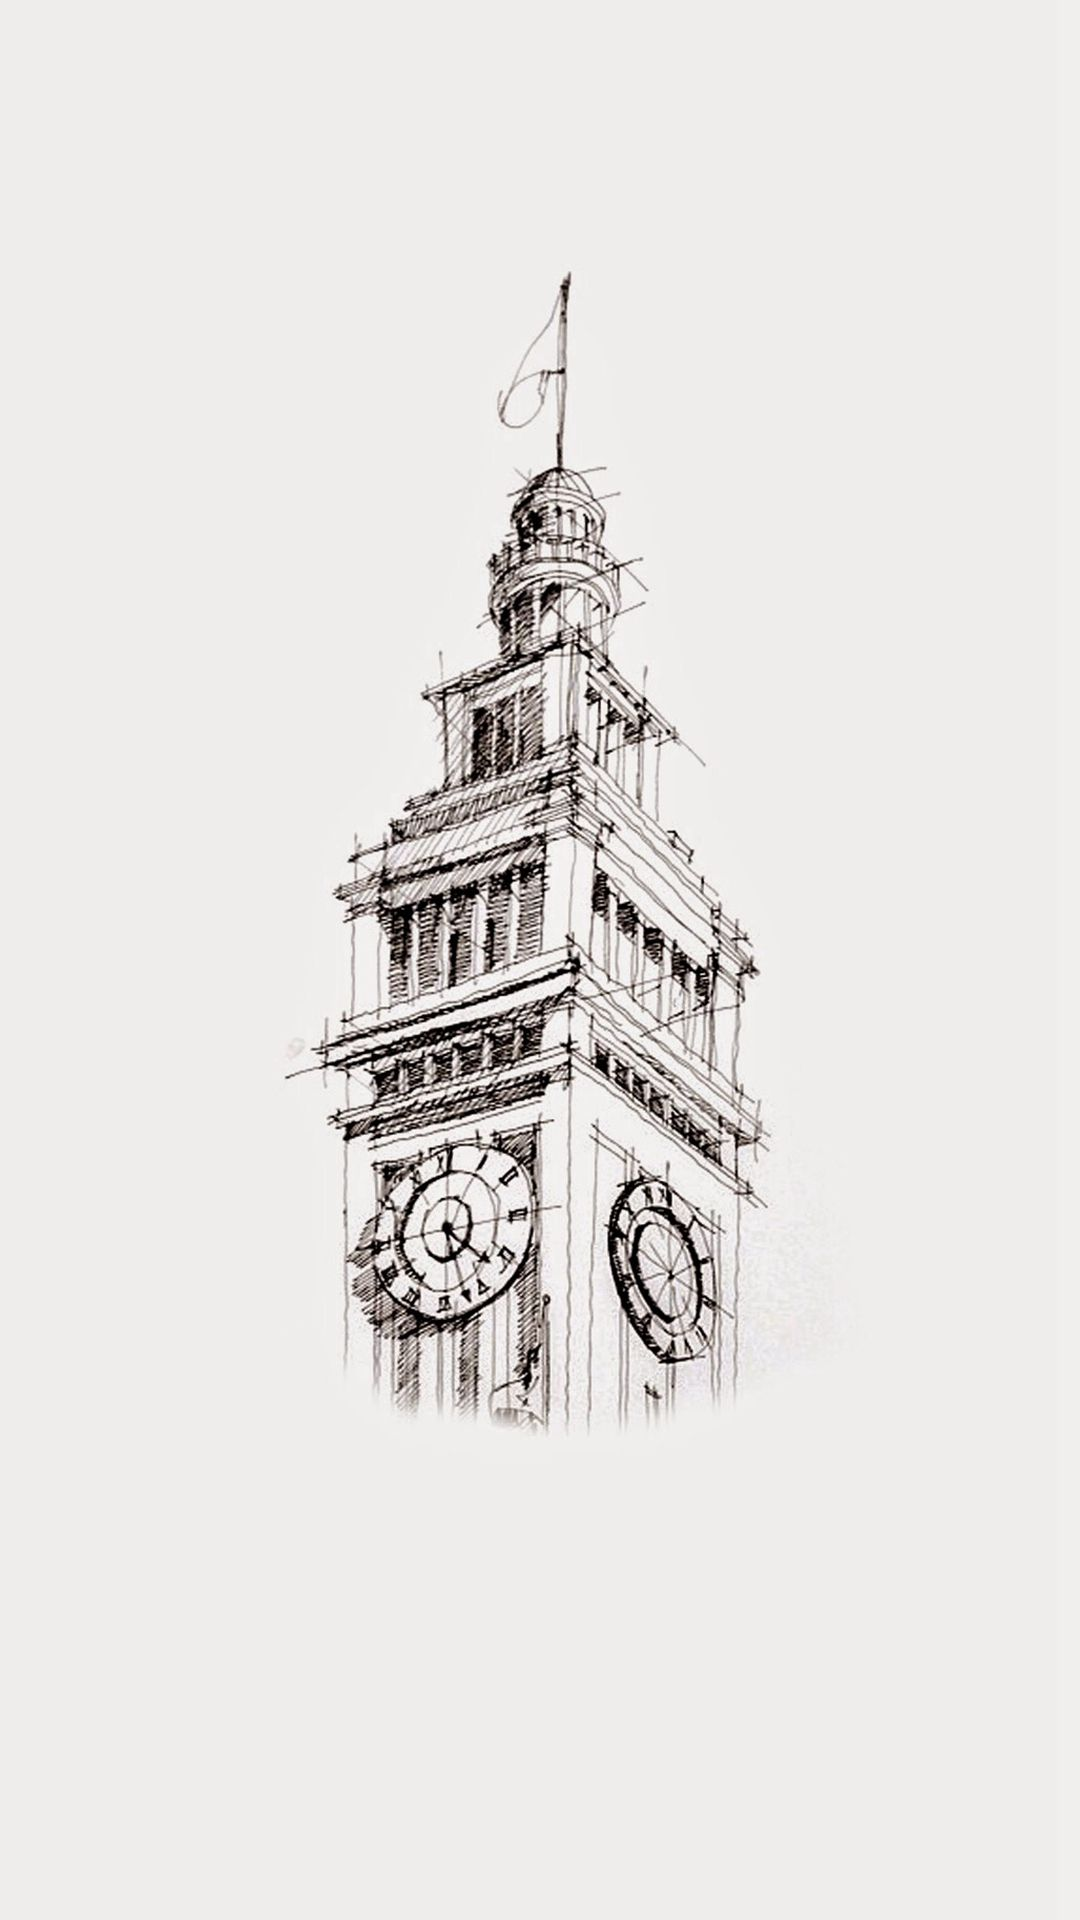 Big Ben Sketch Art Drawn iPhone 6 Wallpaper Download iPhone 1080x1920